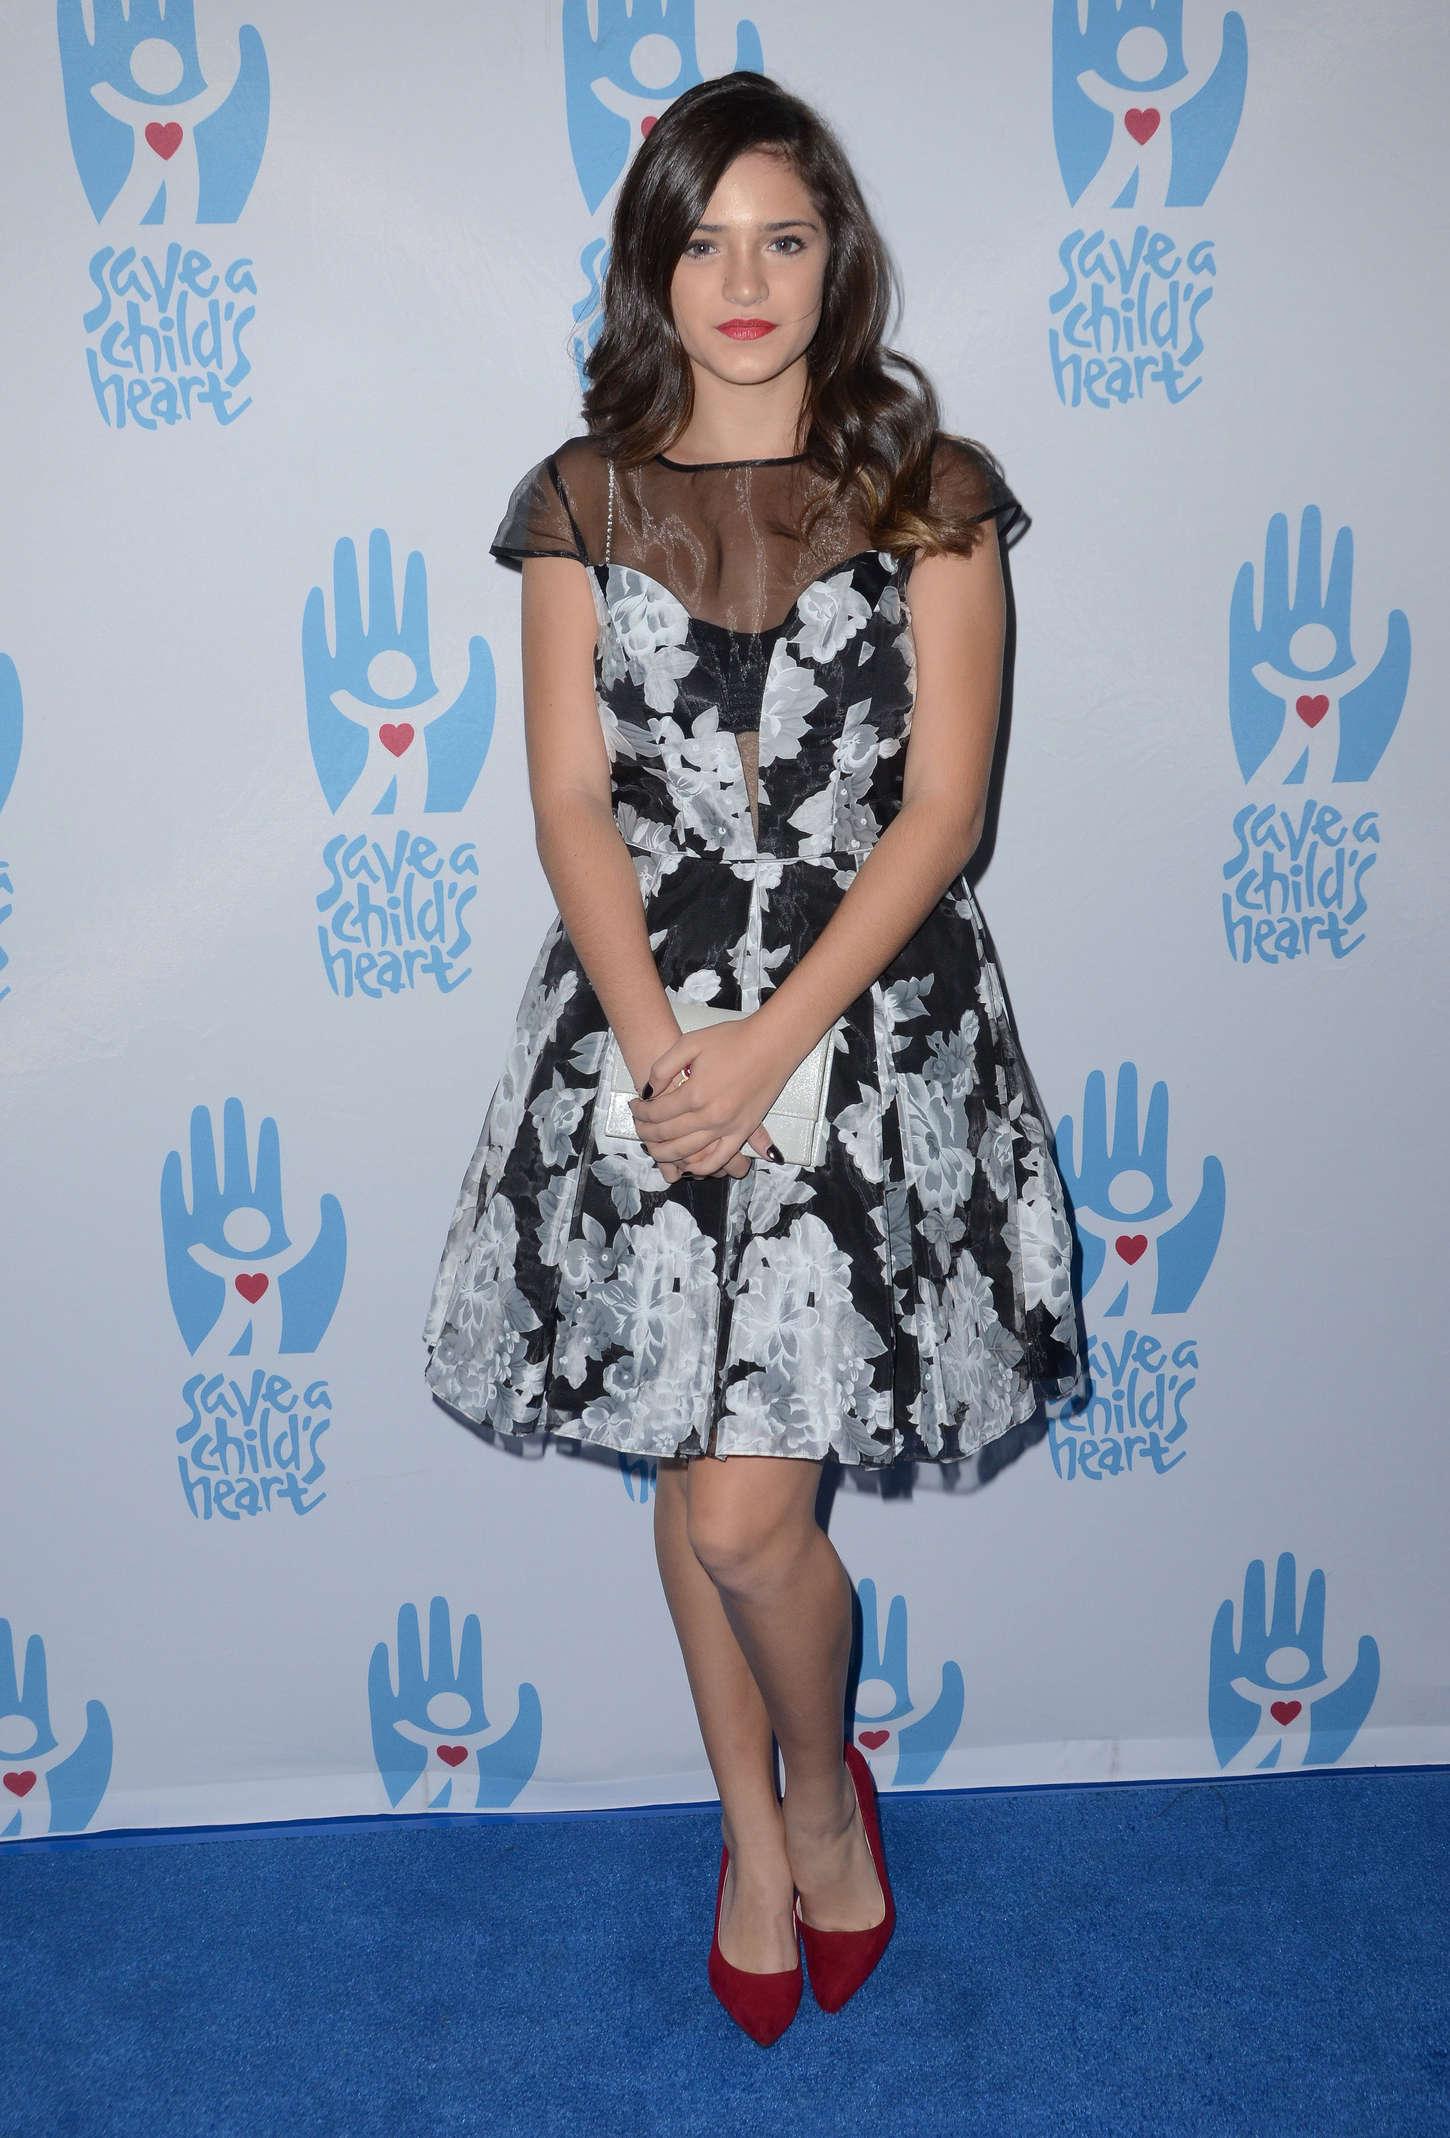 Luna Blaise Annual Save a Childs Heart Gala in Culver City